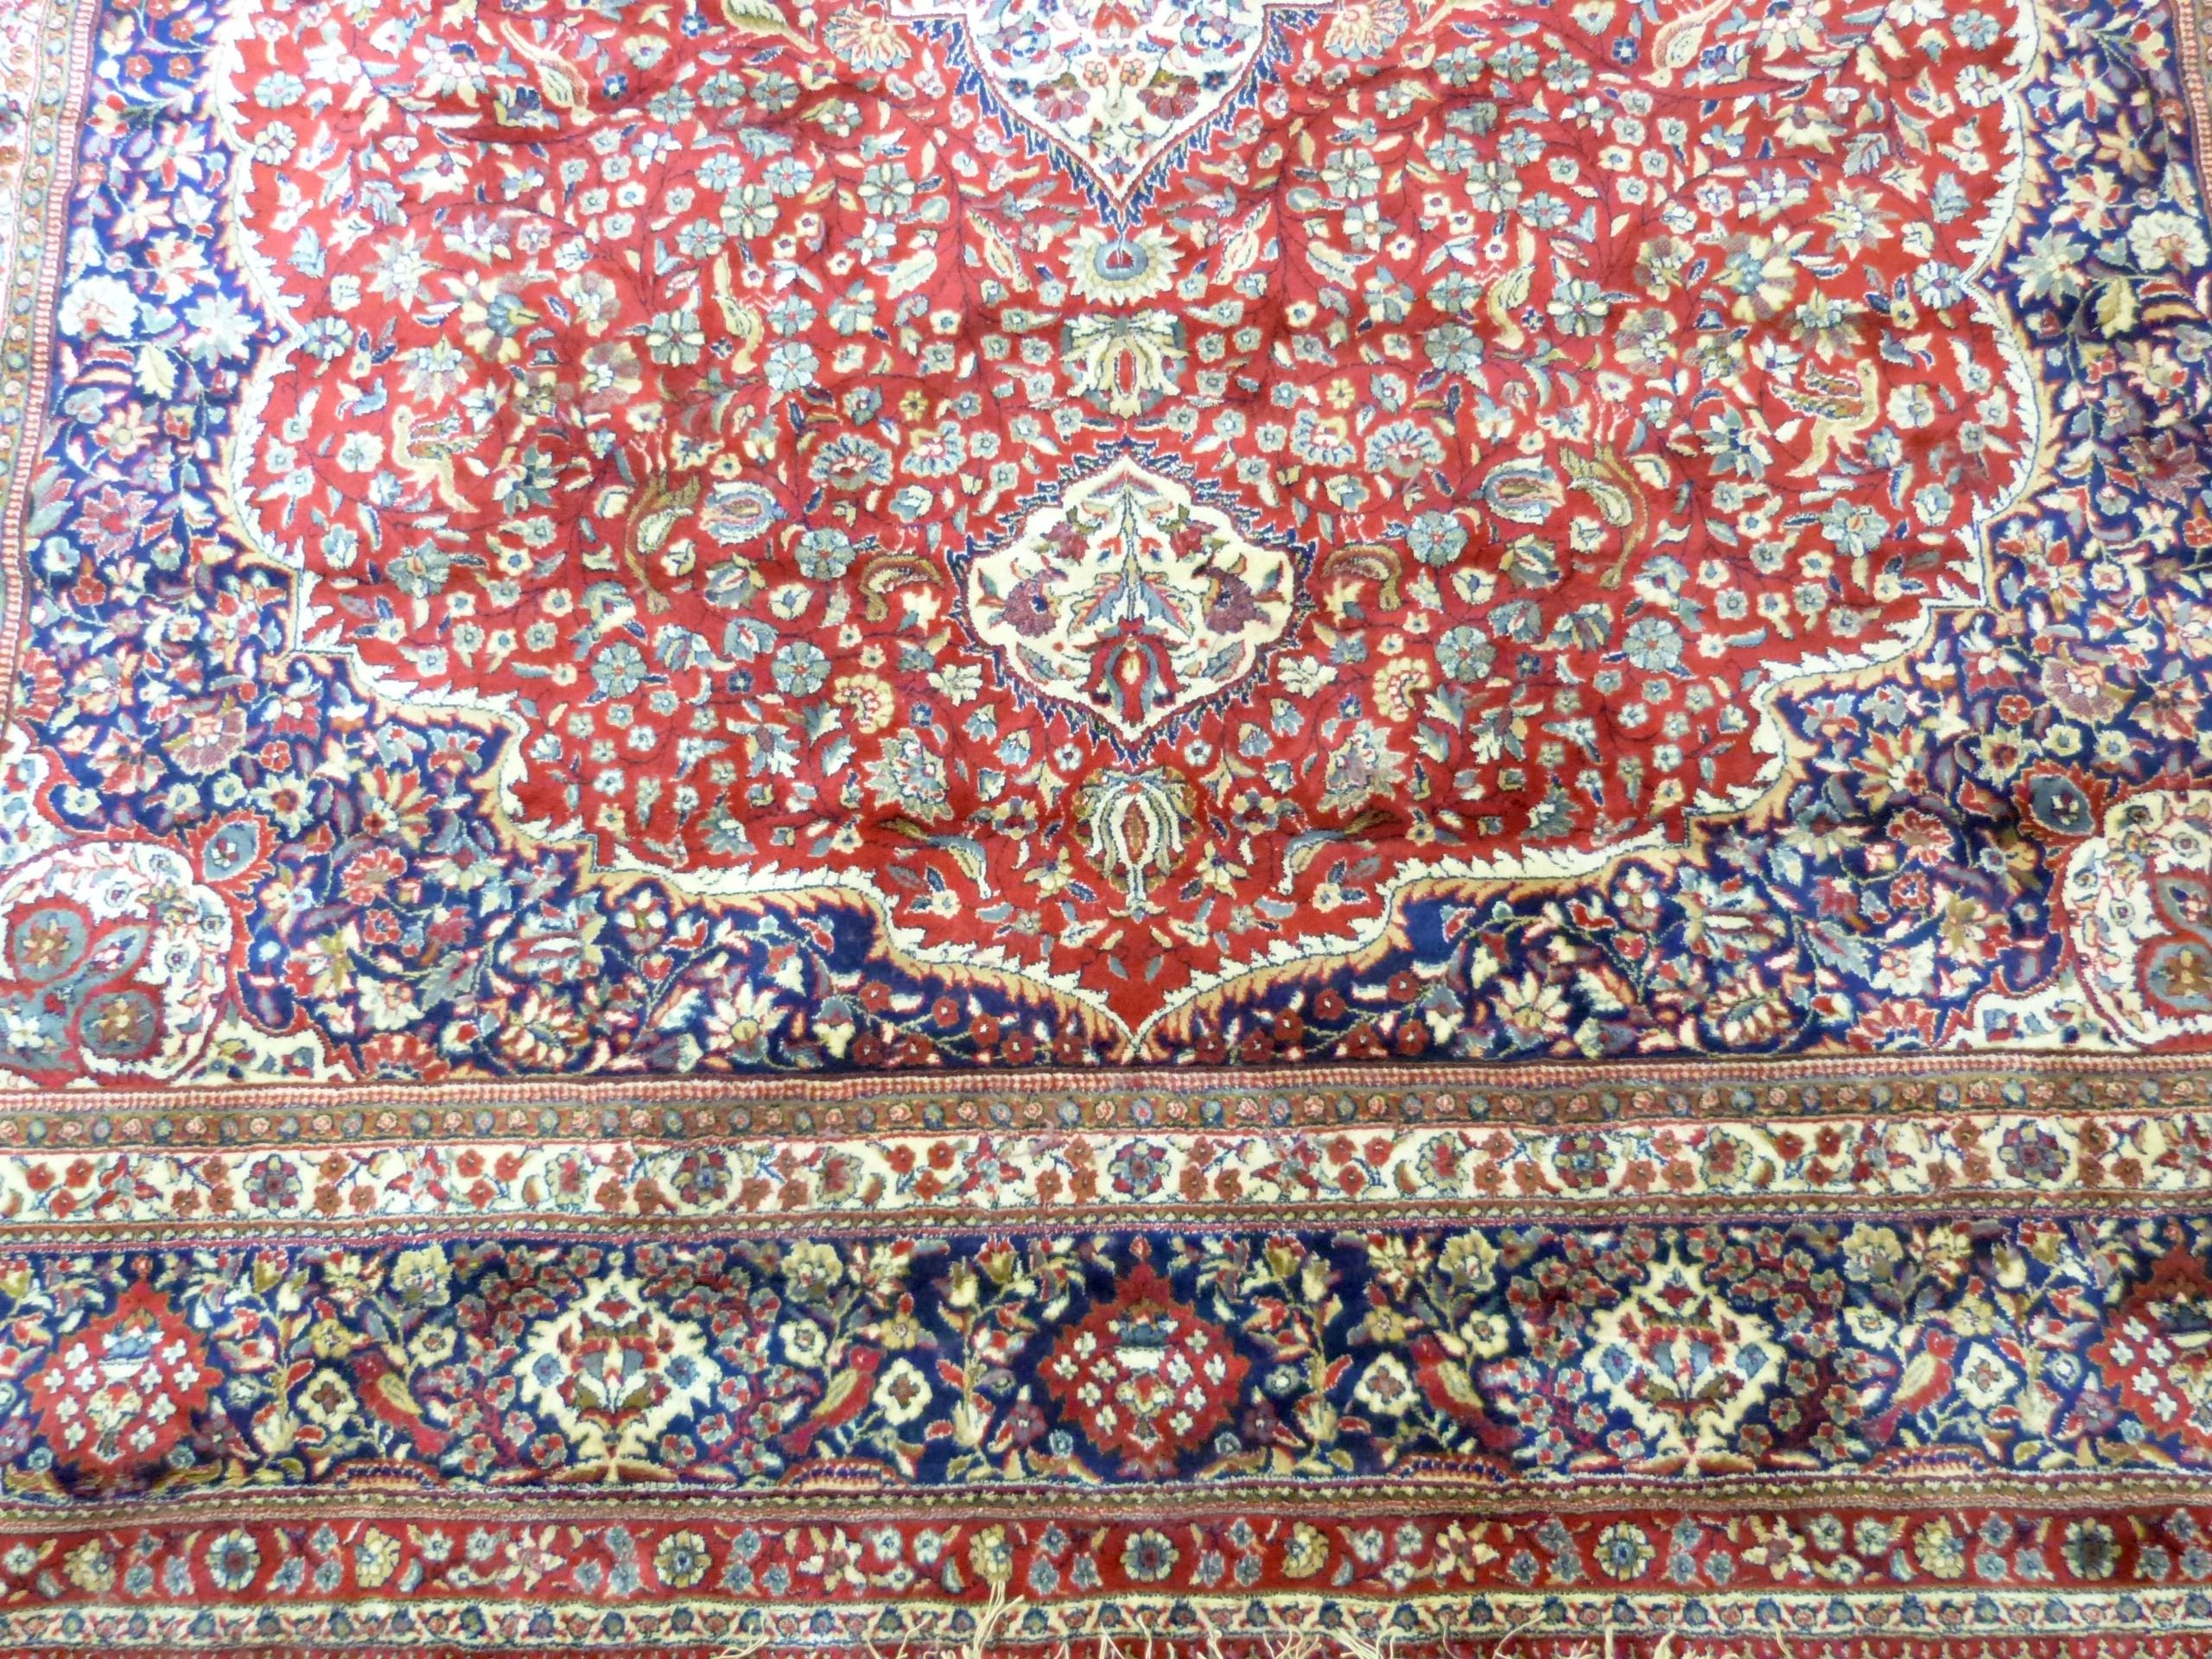 Large red ground full-pile Kashmir Carpet, floral medallion design, 340cm x 230 cm approx - Image 4 of 8